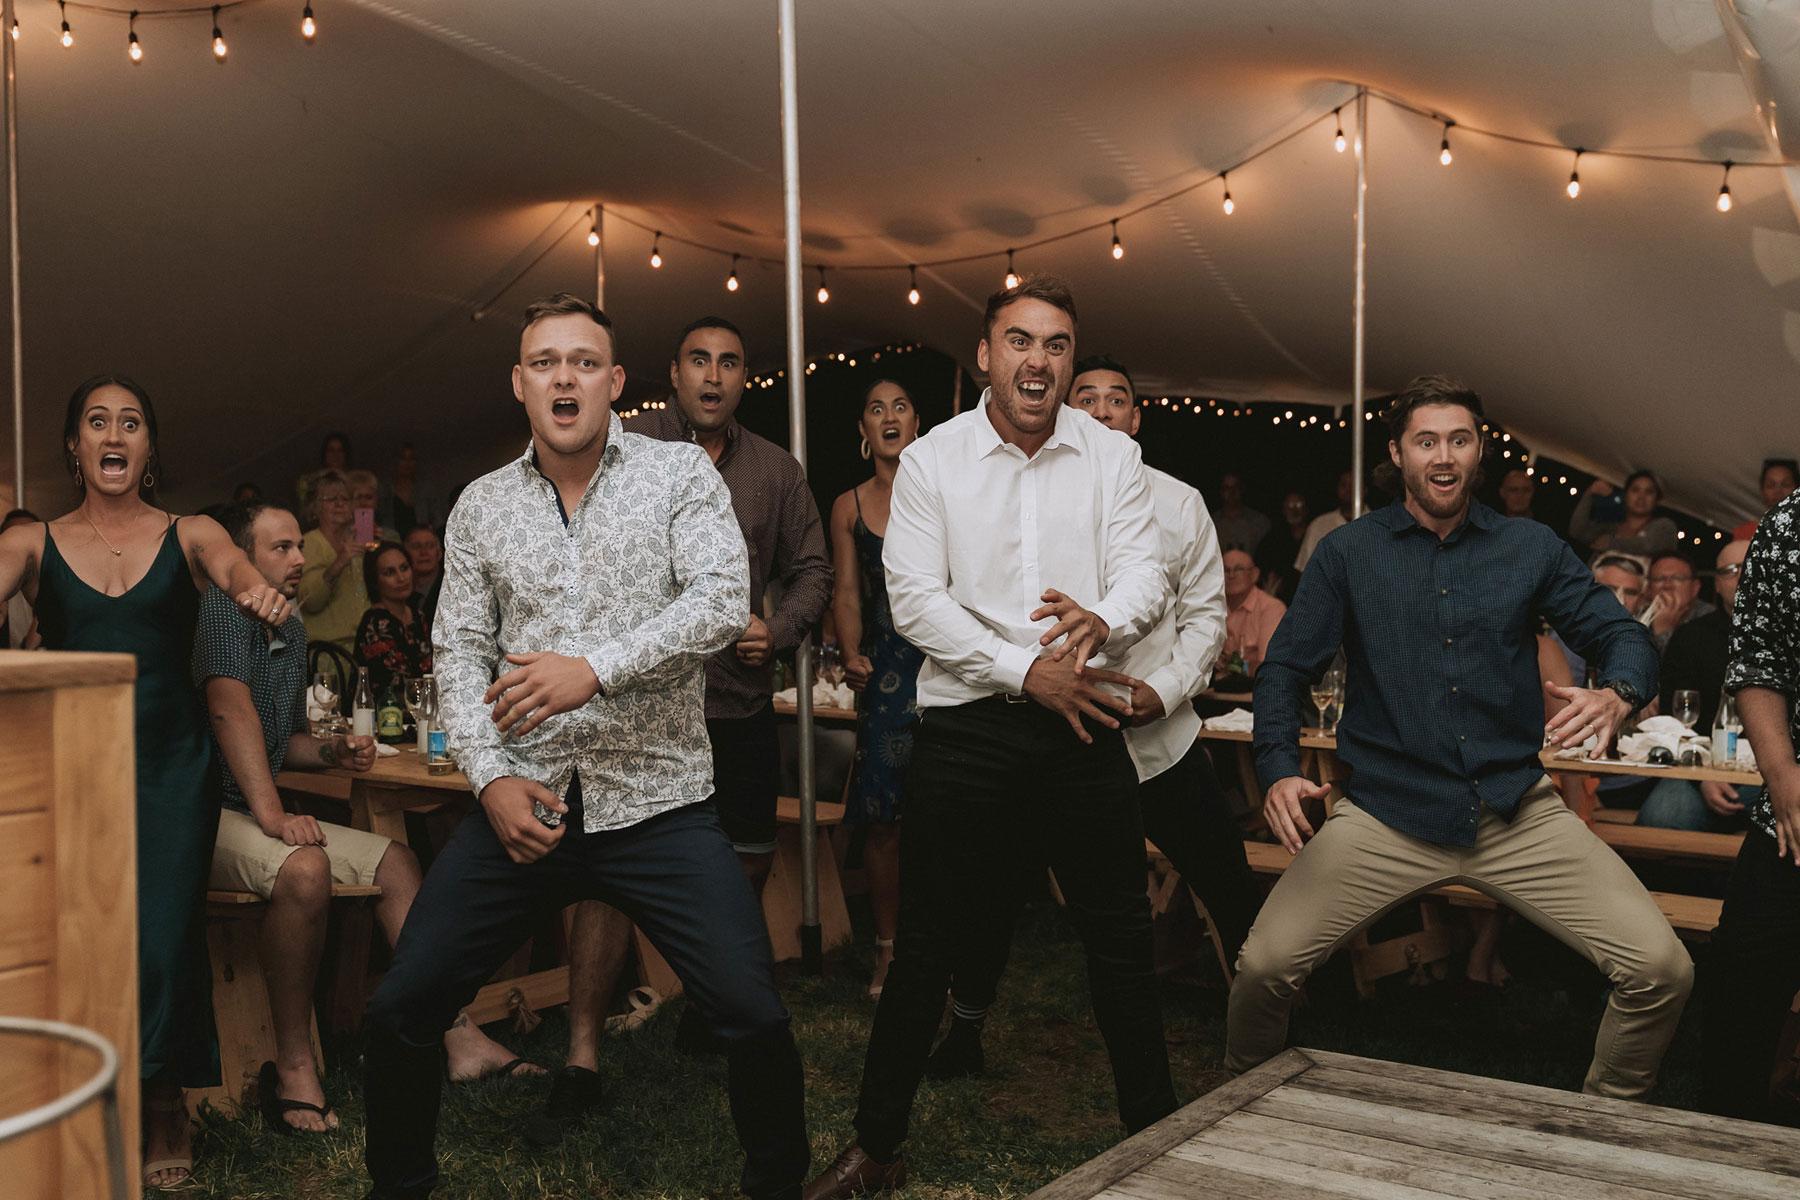 newfound-j-n-orua-beach-house-coromandel-wedding-photographers-857